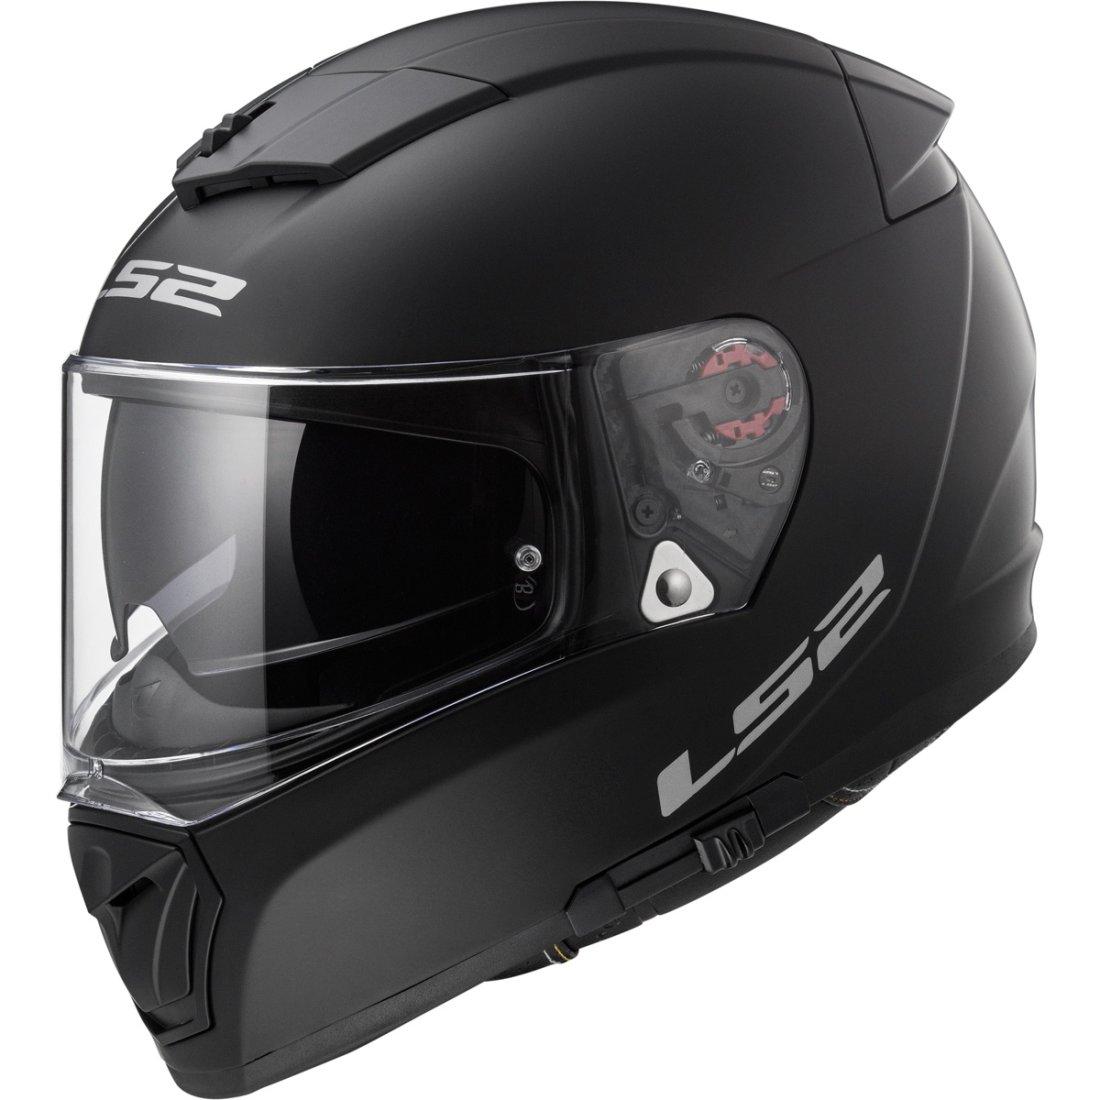 188 Cascos para moto de carretera LS2 · Motocard a18f7a435bf